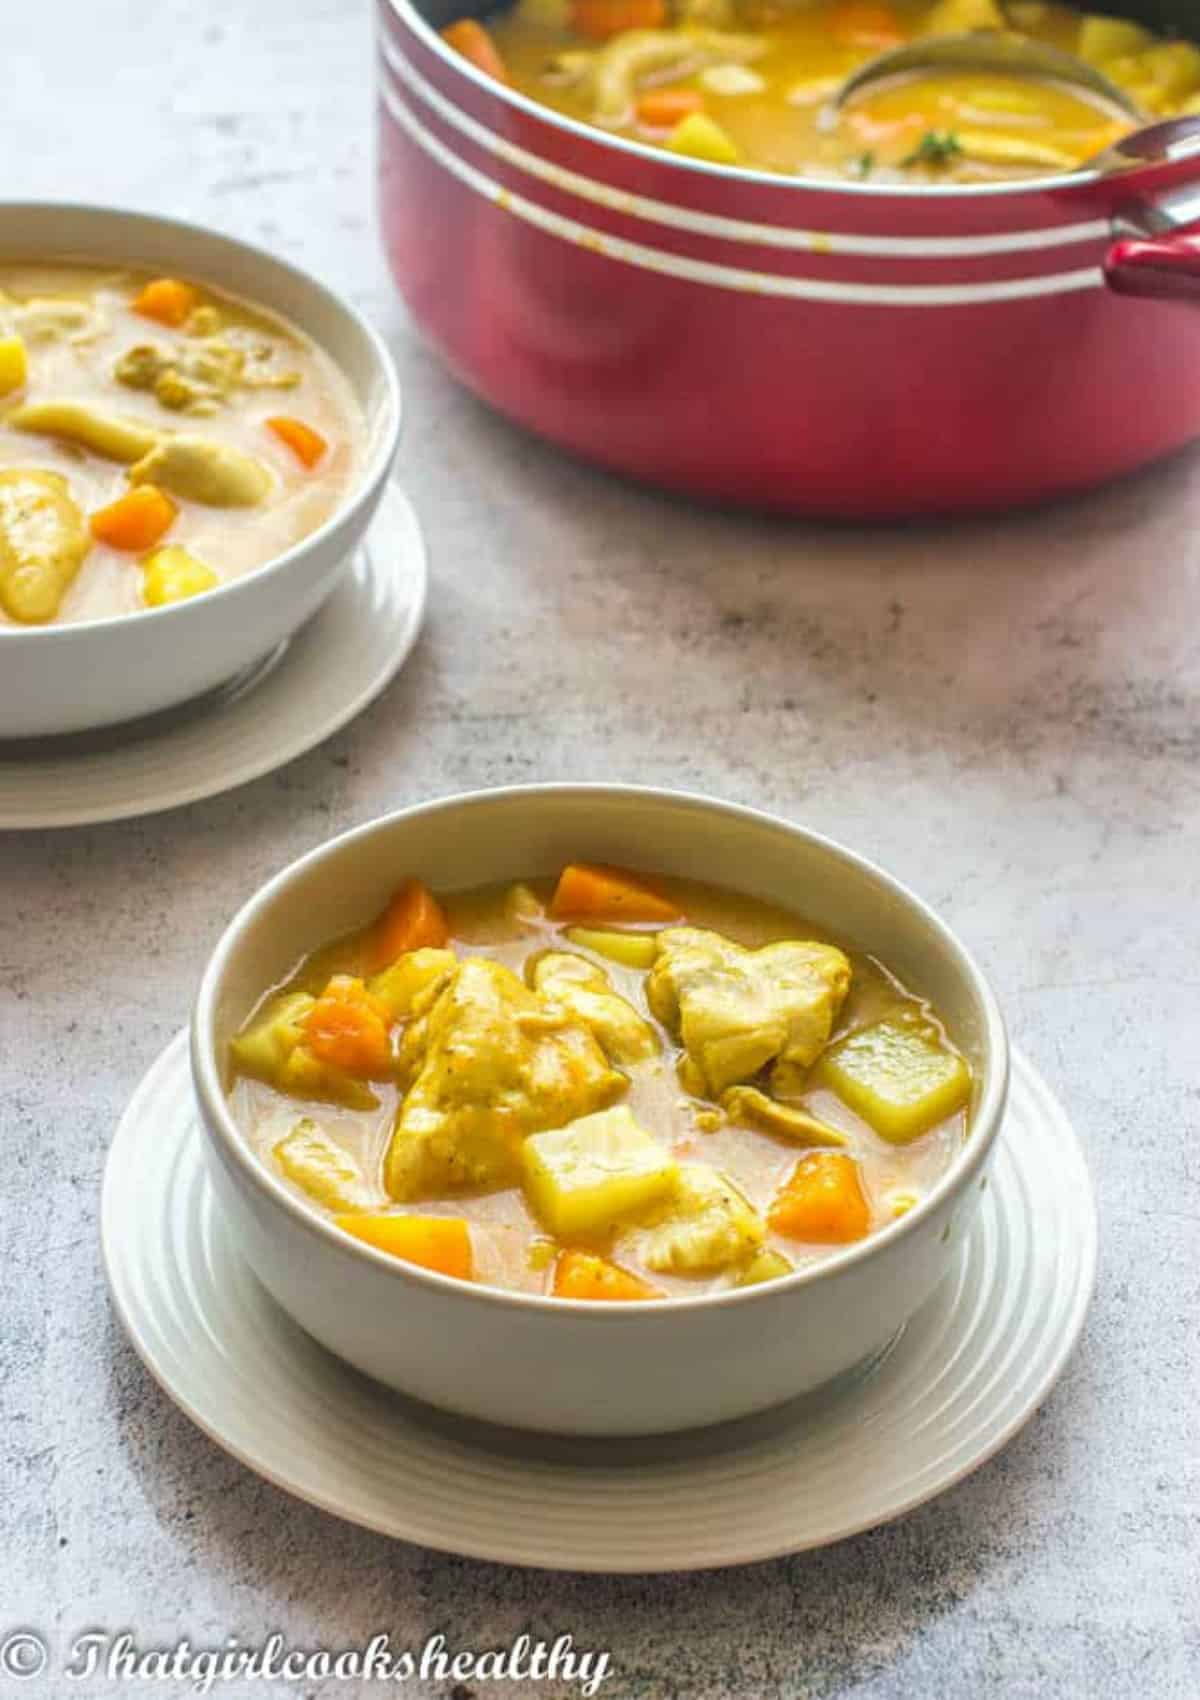 Single bowl of soup